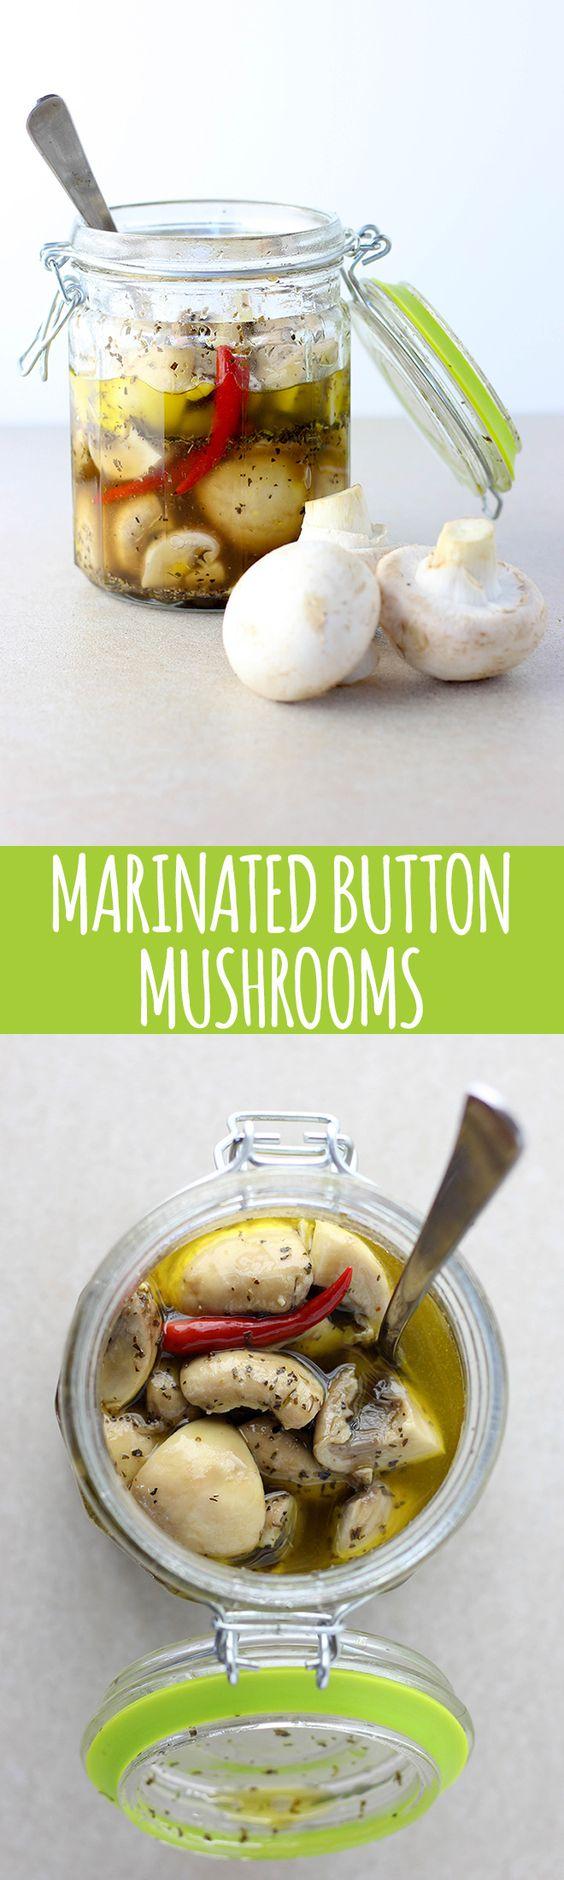 Yummy marinated mushrooms to add to salads and antipasto platters. -Vegan Mariposa